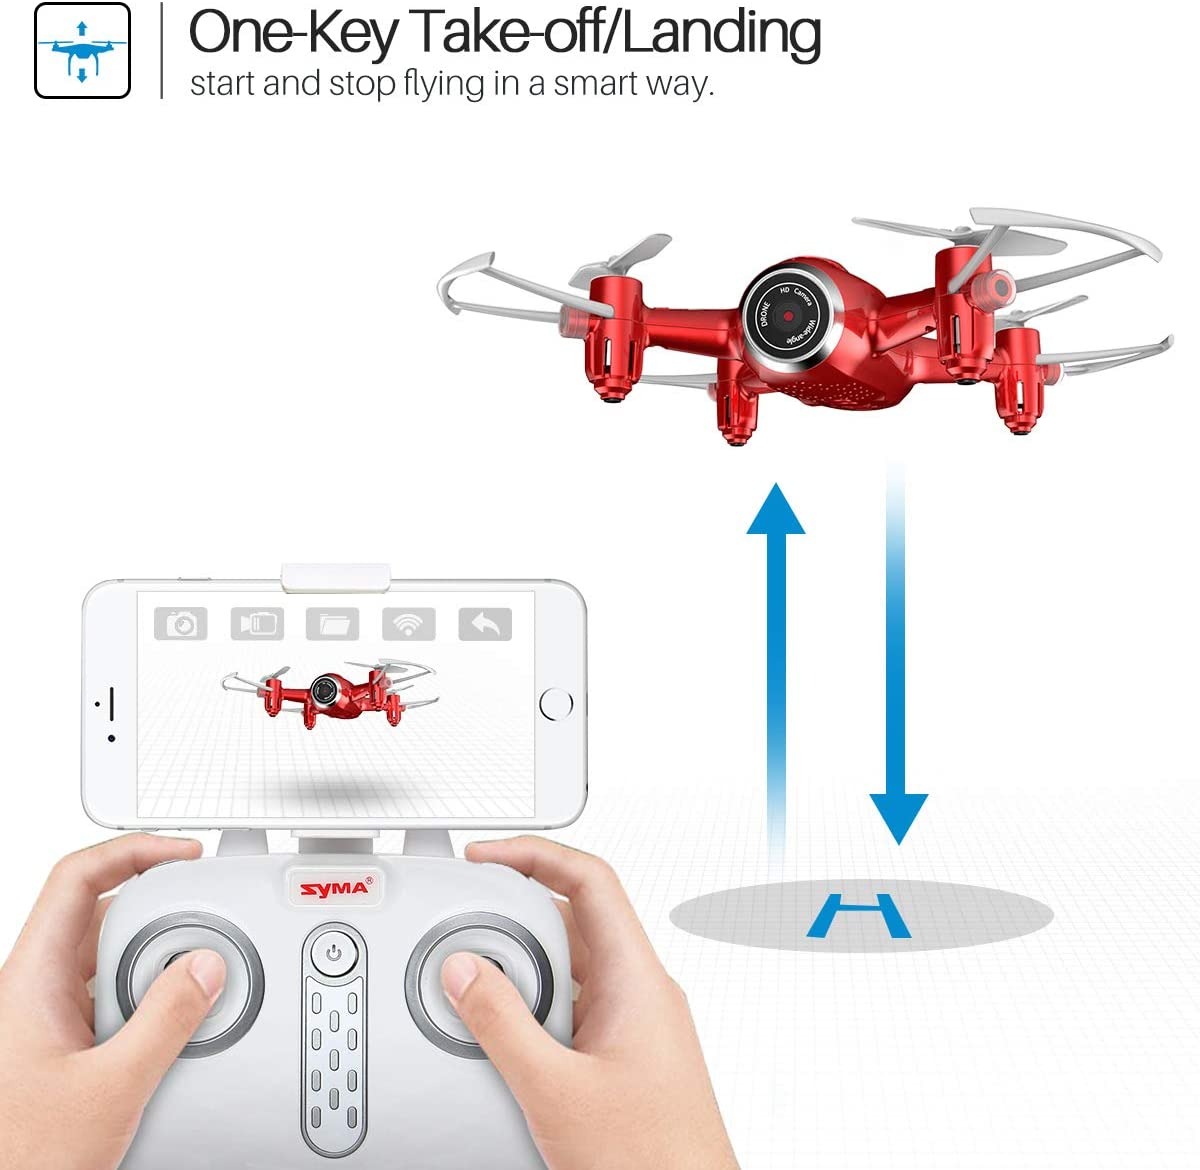 syma x22w mini drone review as pocket drone with camera